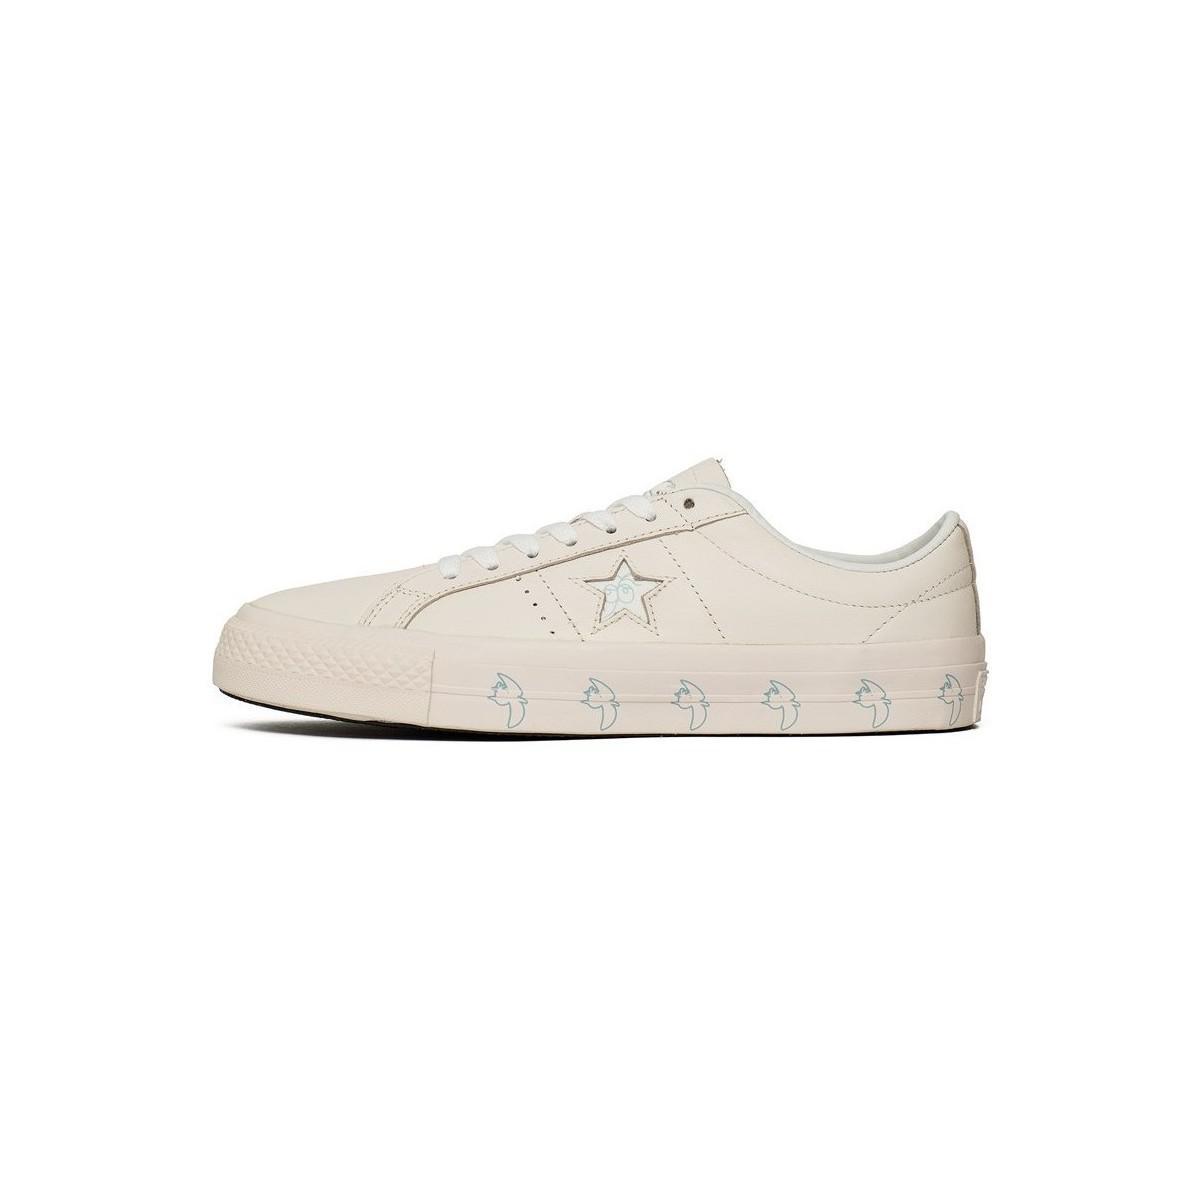 ce15278b3f4 Converse X Illegal Civilization One Star Pro Ox Men s Shoes ...